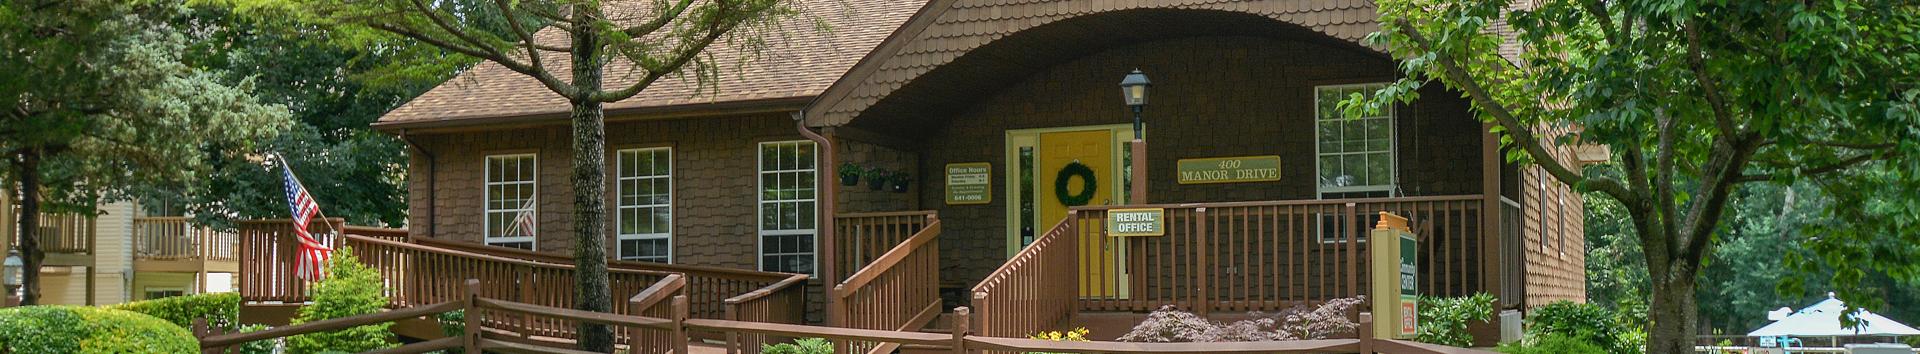 Office of Manor Communities, Lancaster/Pennsylvania